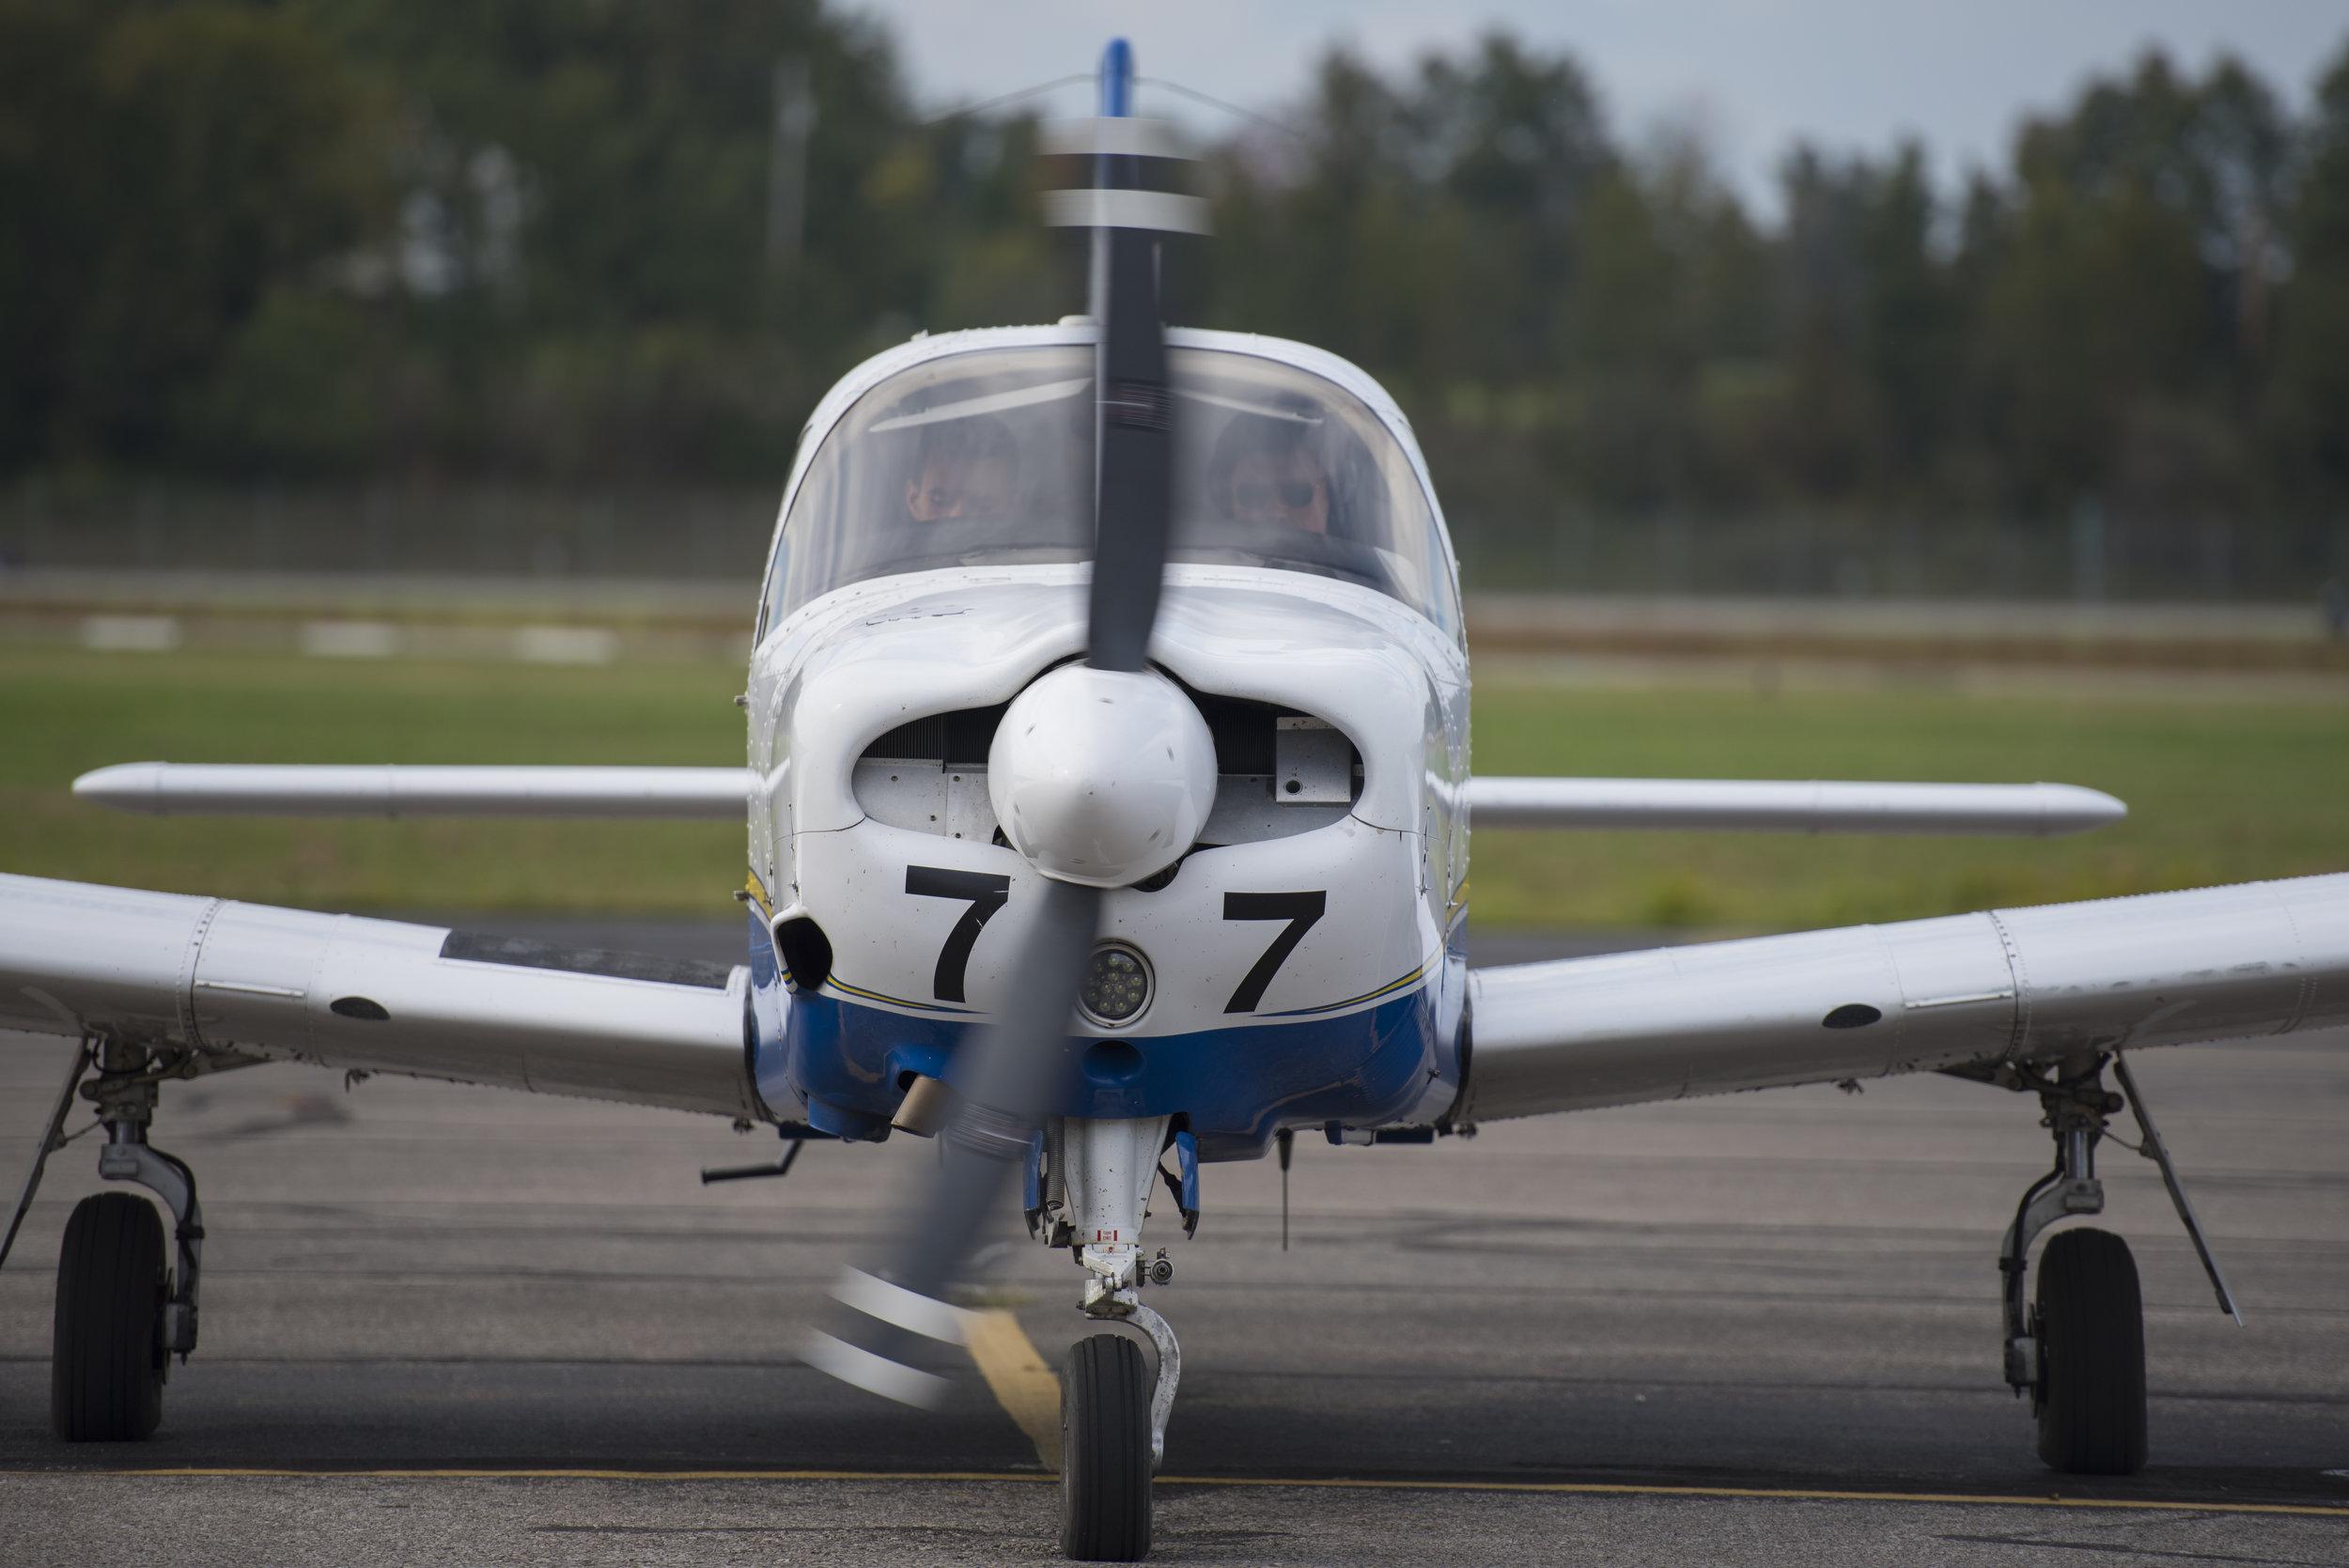 Ohio University senior Ryan Potter and flight instructor Garrett Bussa prepare for take off on Sept. 20, 2017.